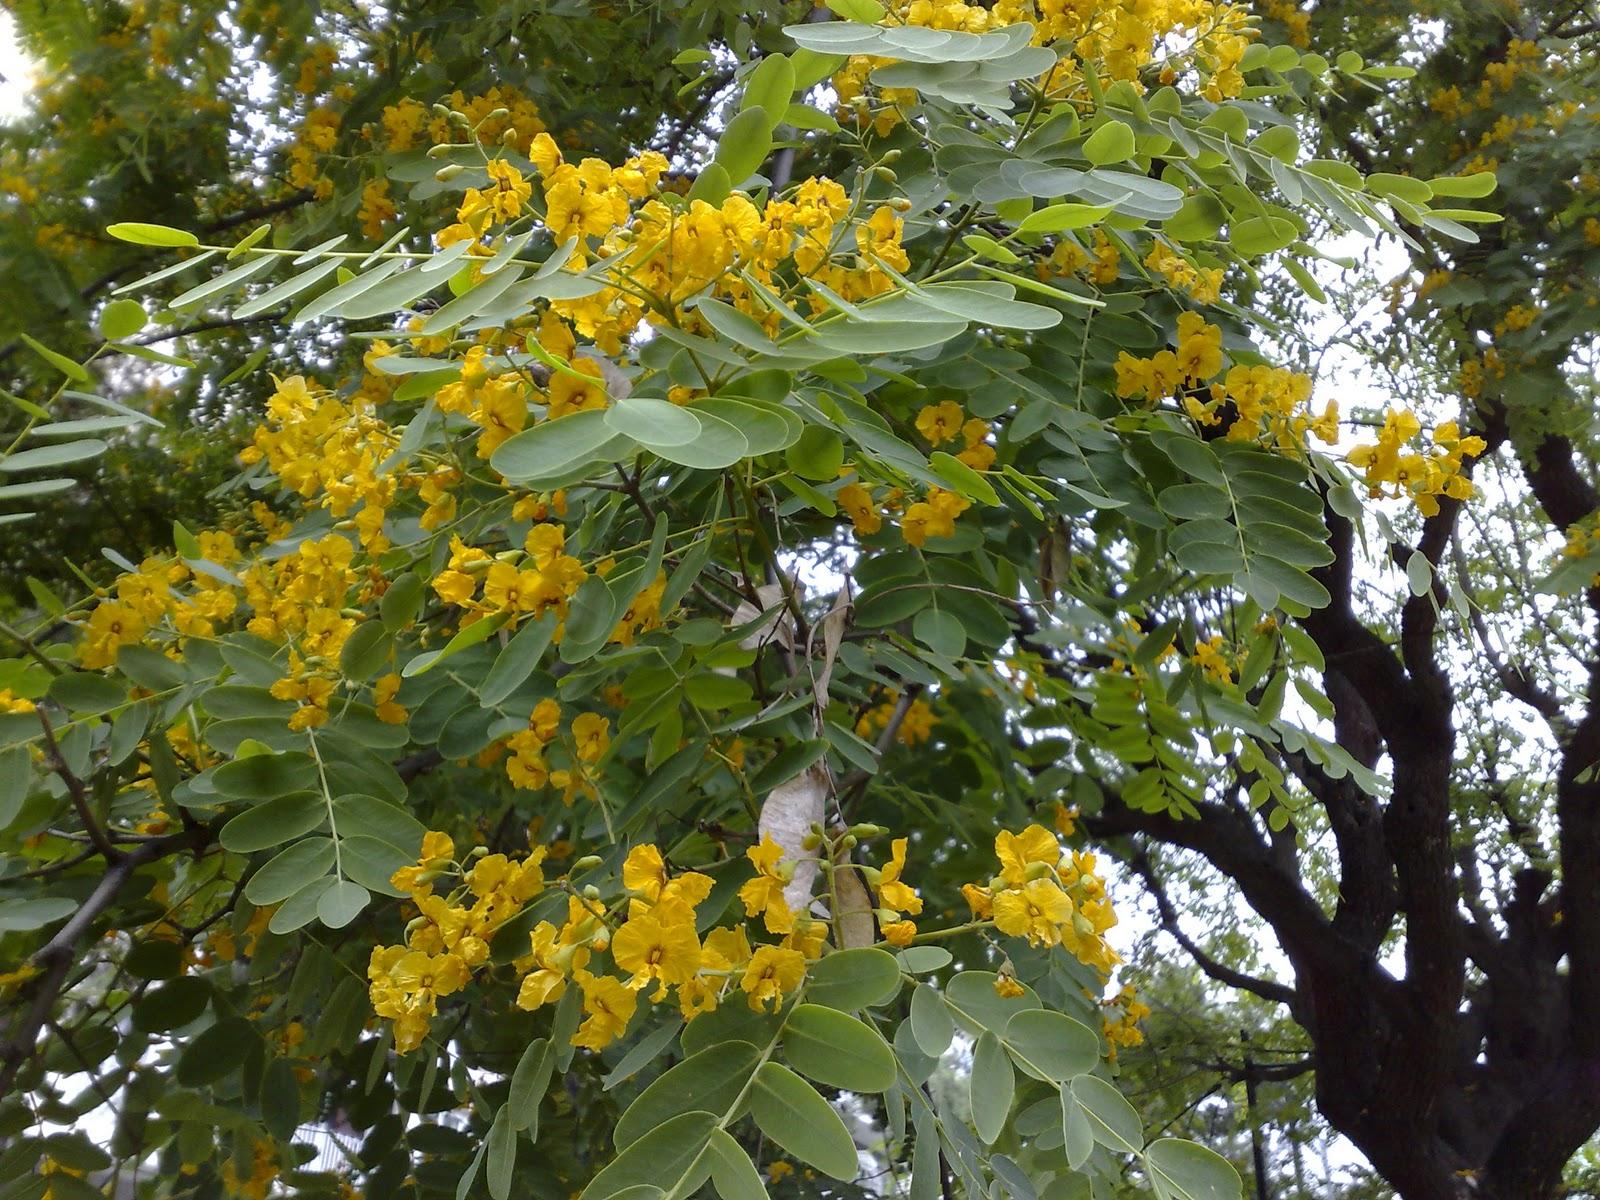 2316 P Acacia de flor amarilla. Flor 19062009.jpg